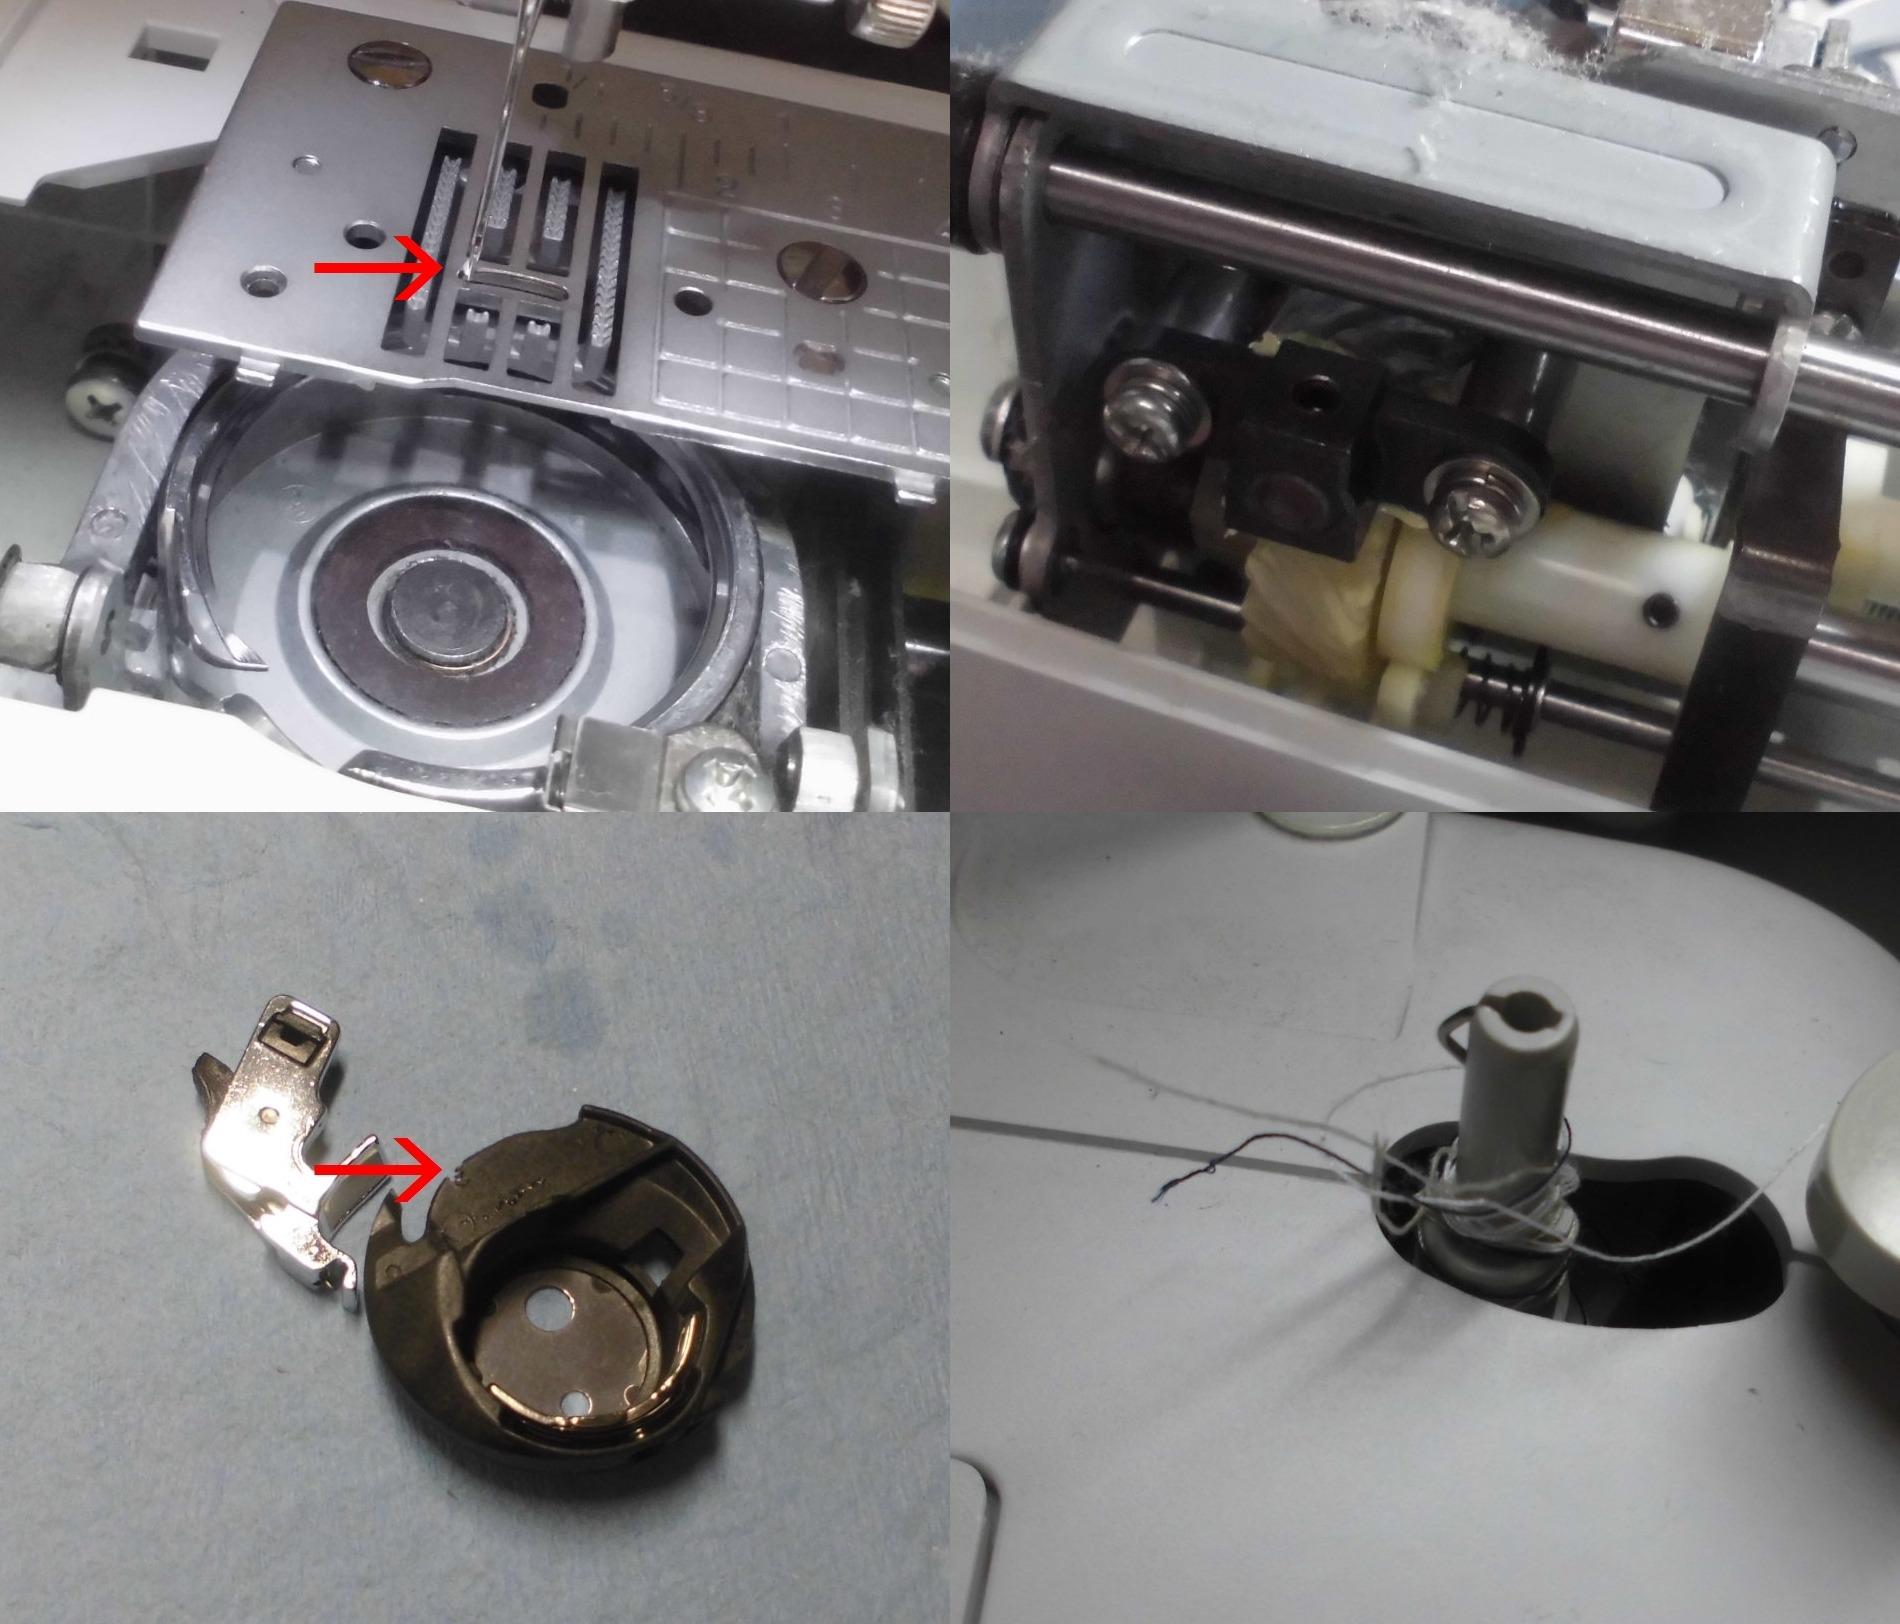 HS102・CPS40の故障や不具合|縫えない、糸が絡まる、エラーE6、下糸を拾わない